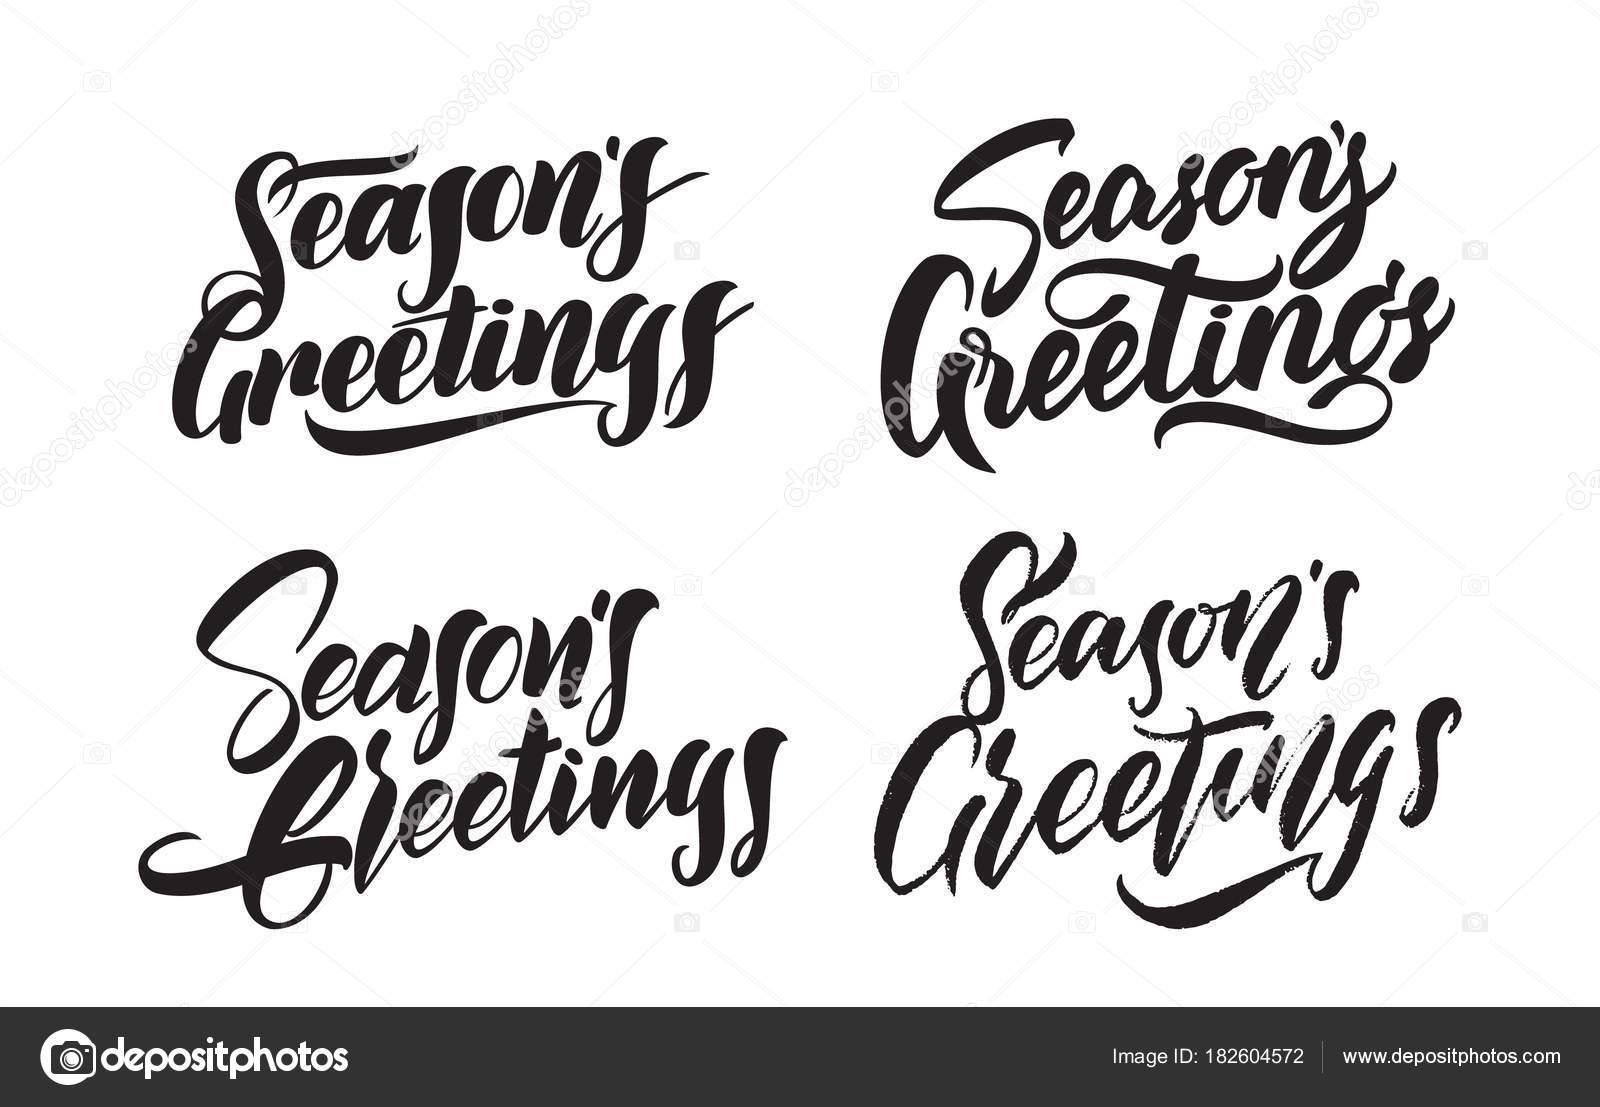 Set Of Handwritten Type Lettering Of Seasons Greetings Typography